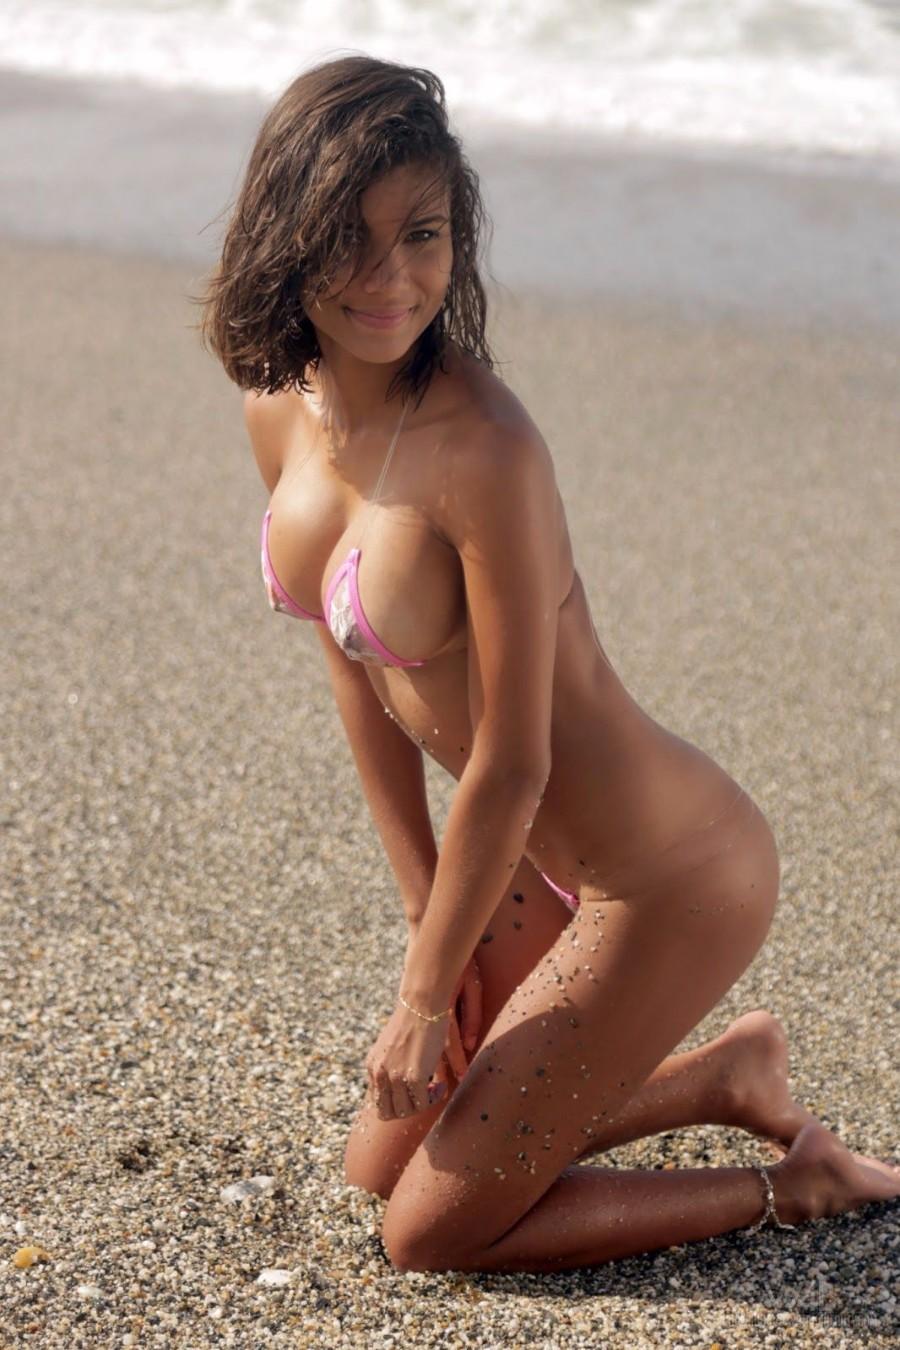 Загорелая на пляже